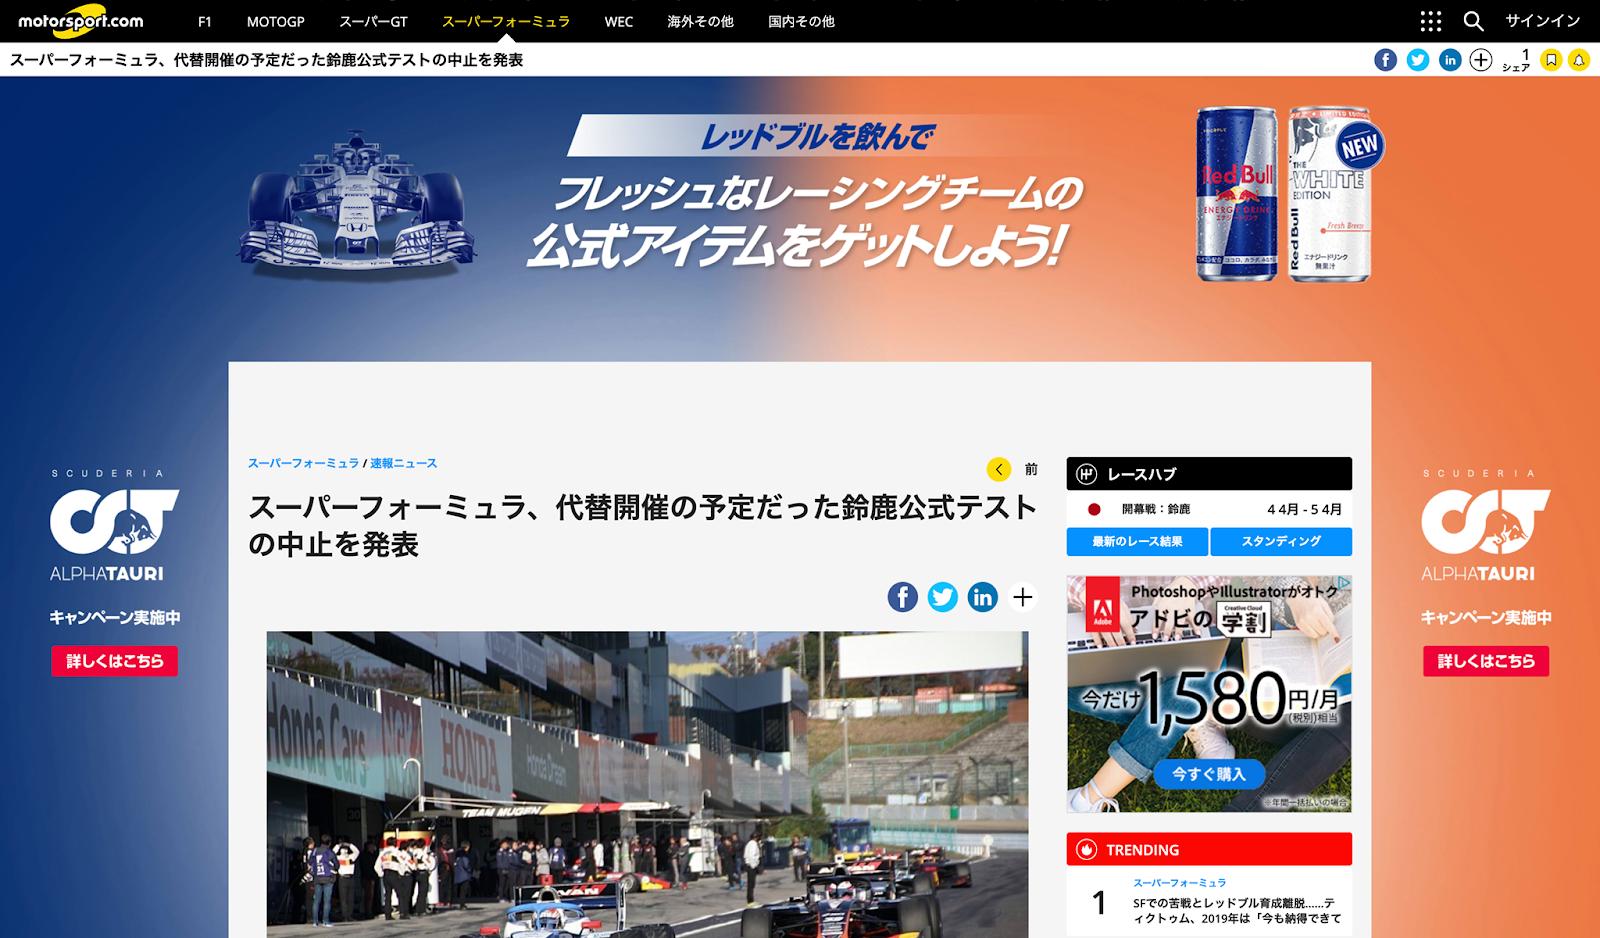 AnyMind AdAsia FourM PMP Case Study Publisher Screenshot